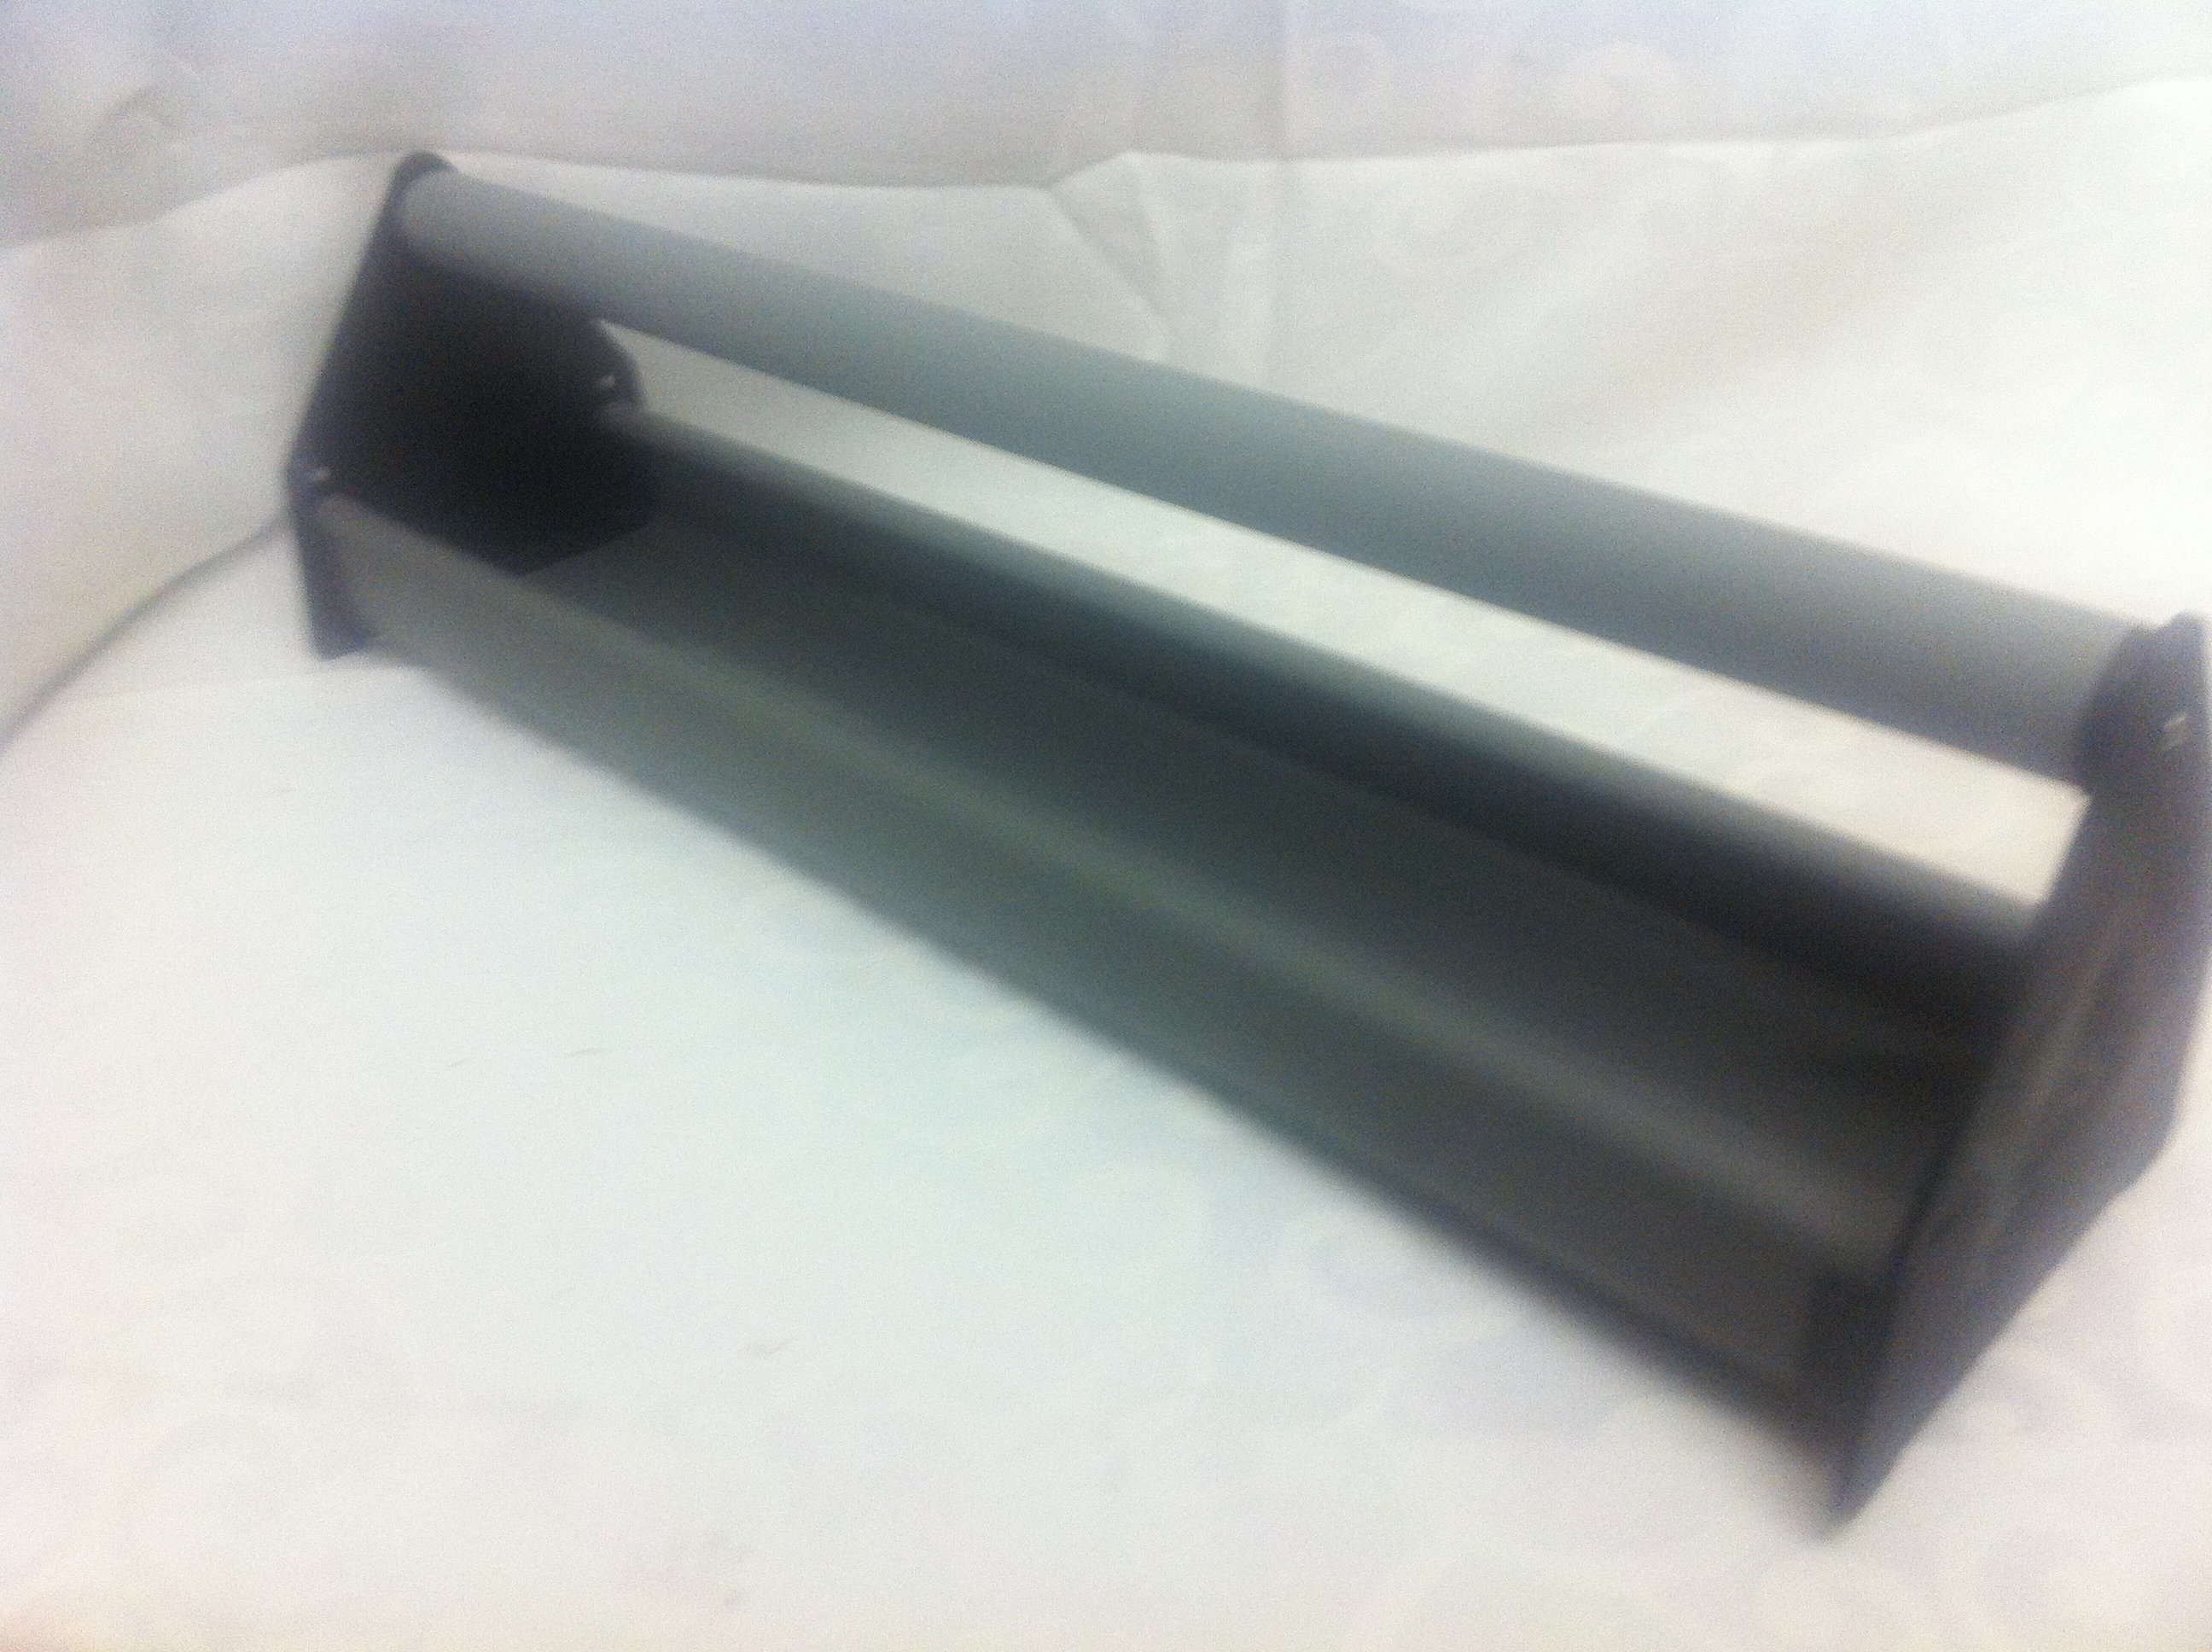 Kunststofftrog mit Abwehrrolle 50cm